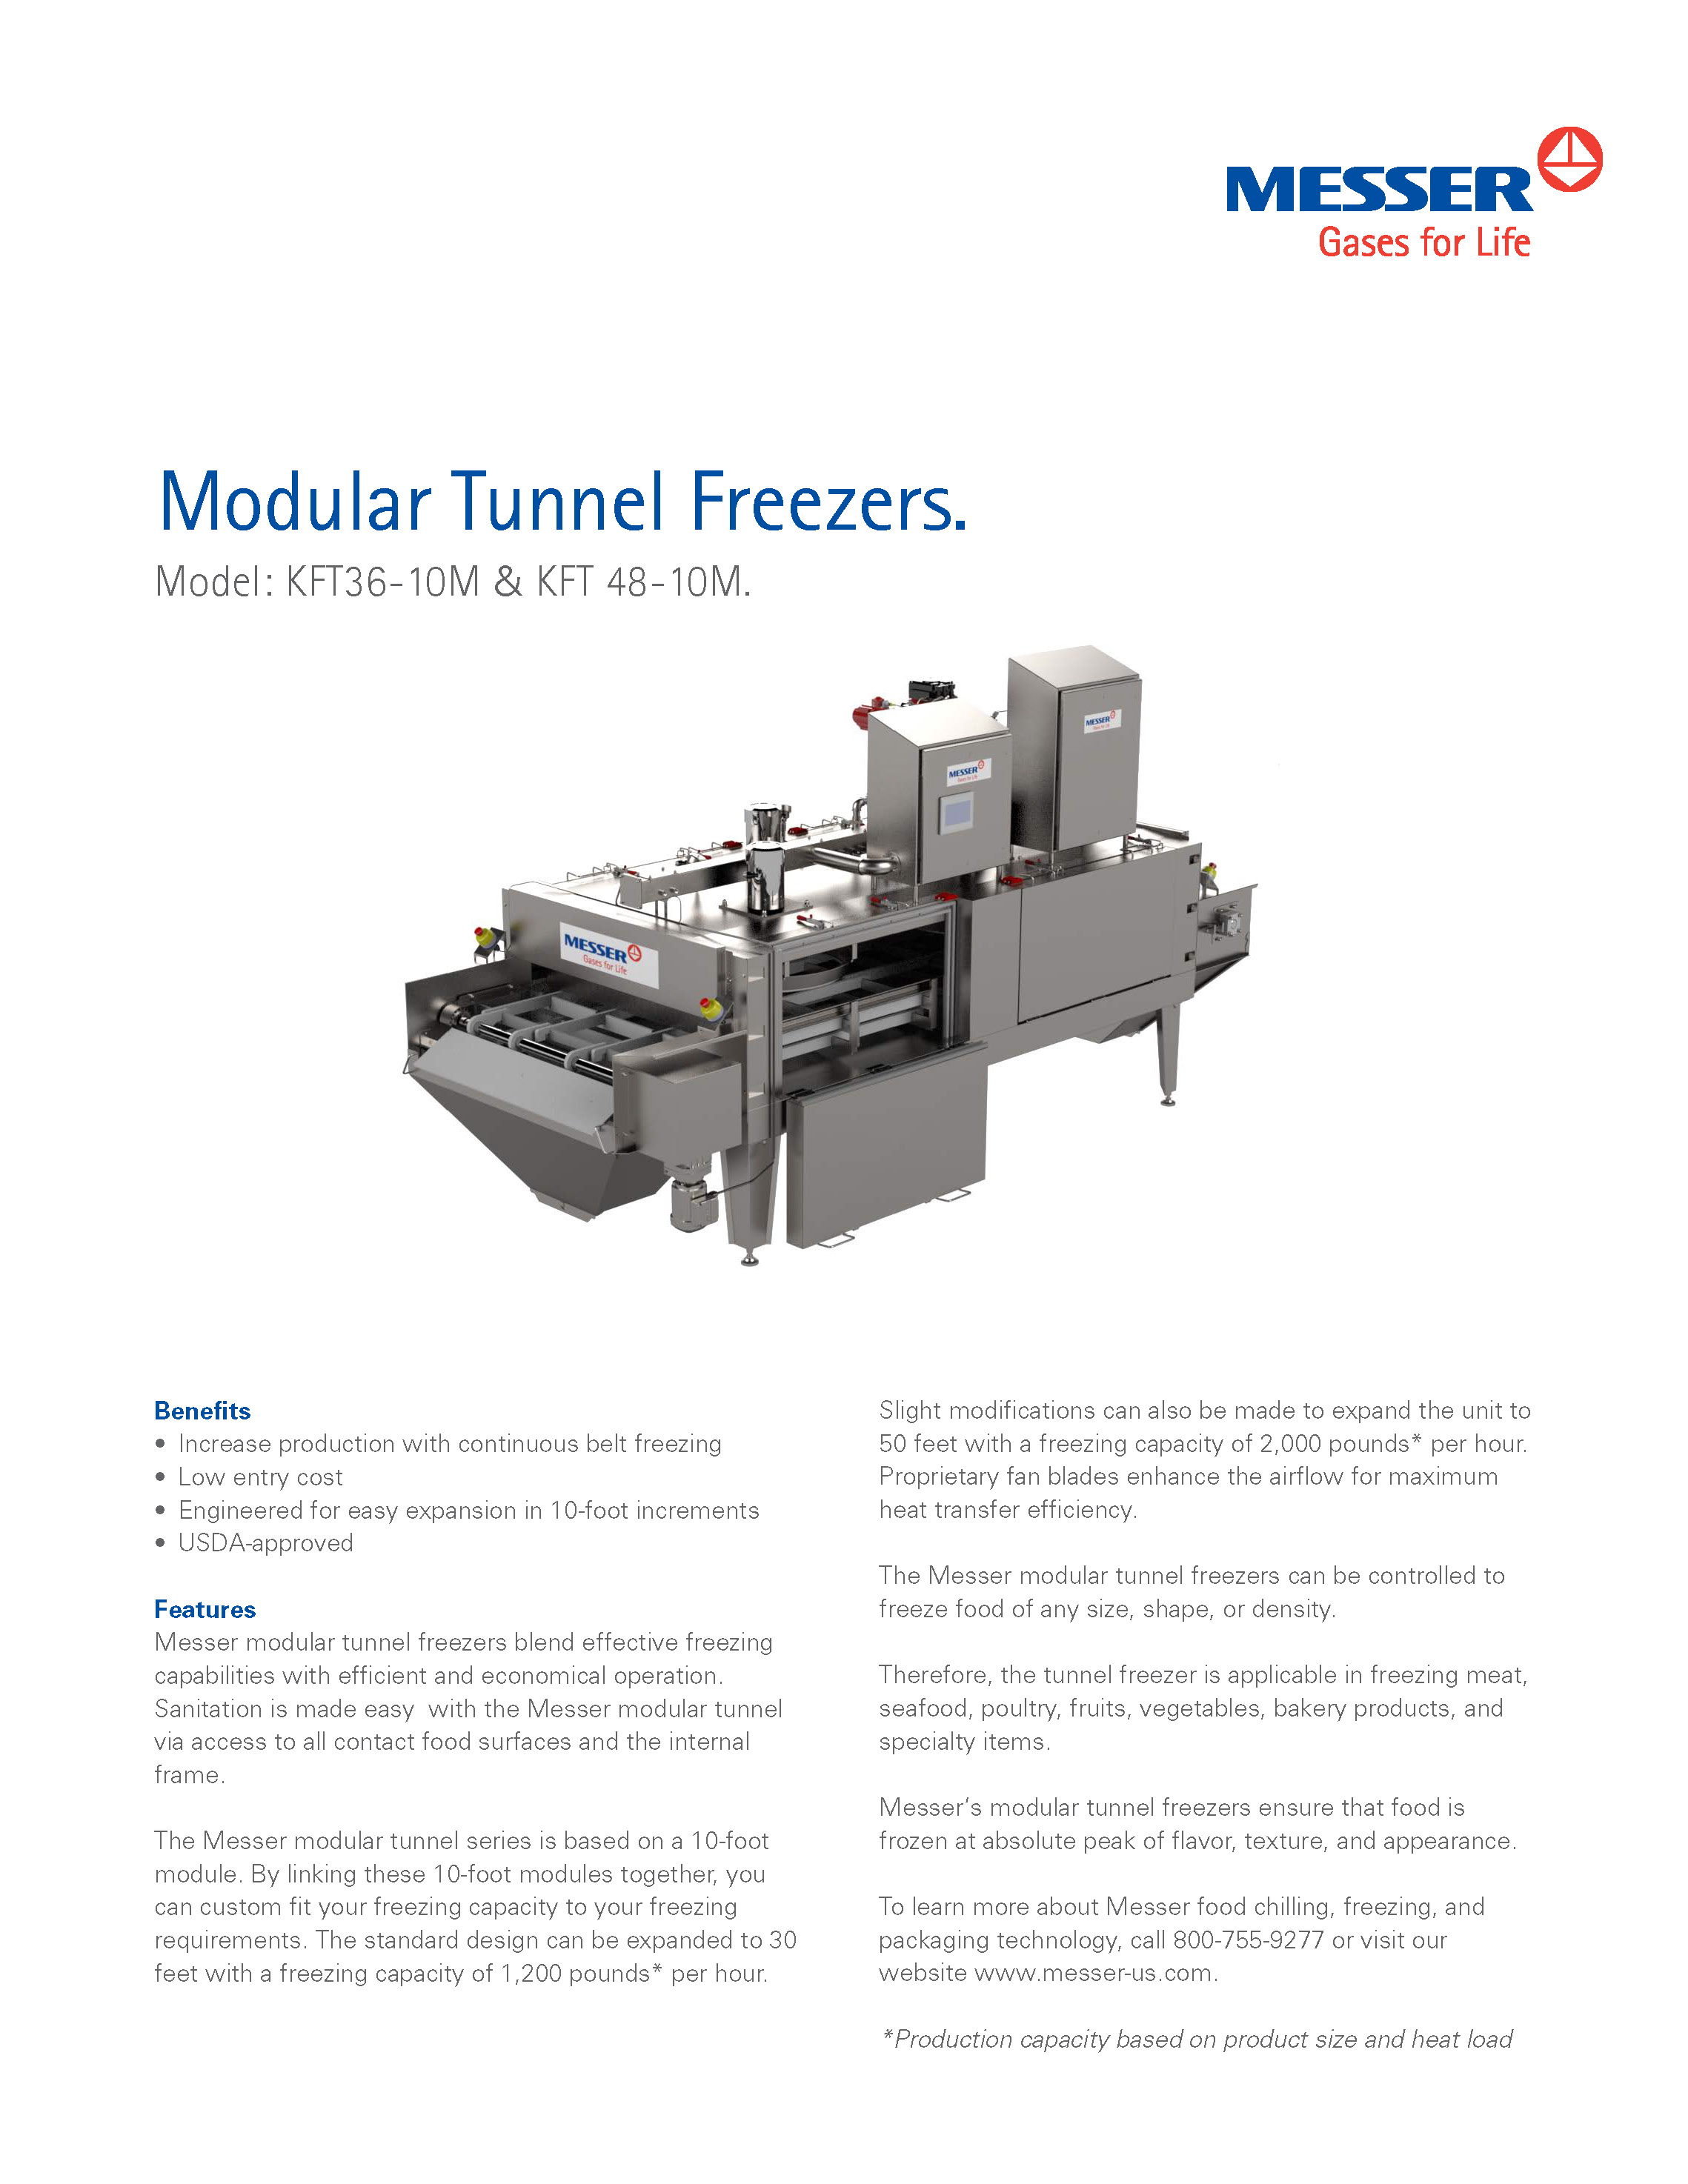 Messer's Modular Tunnel Freezer